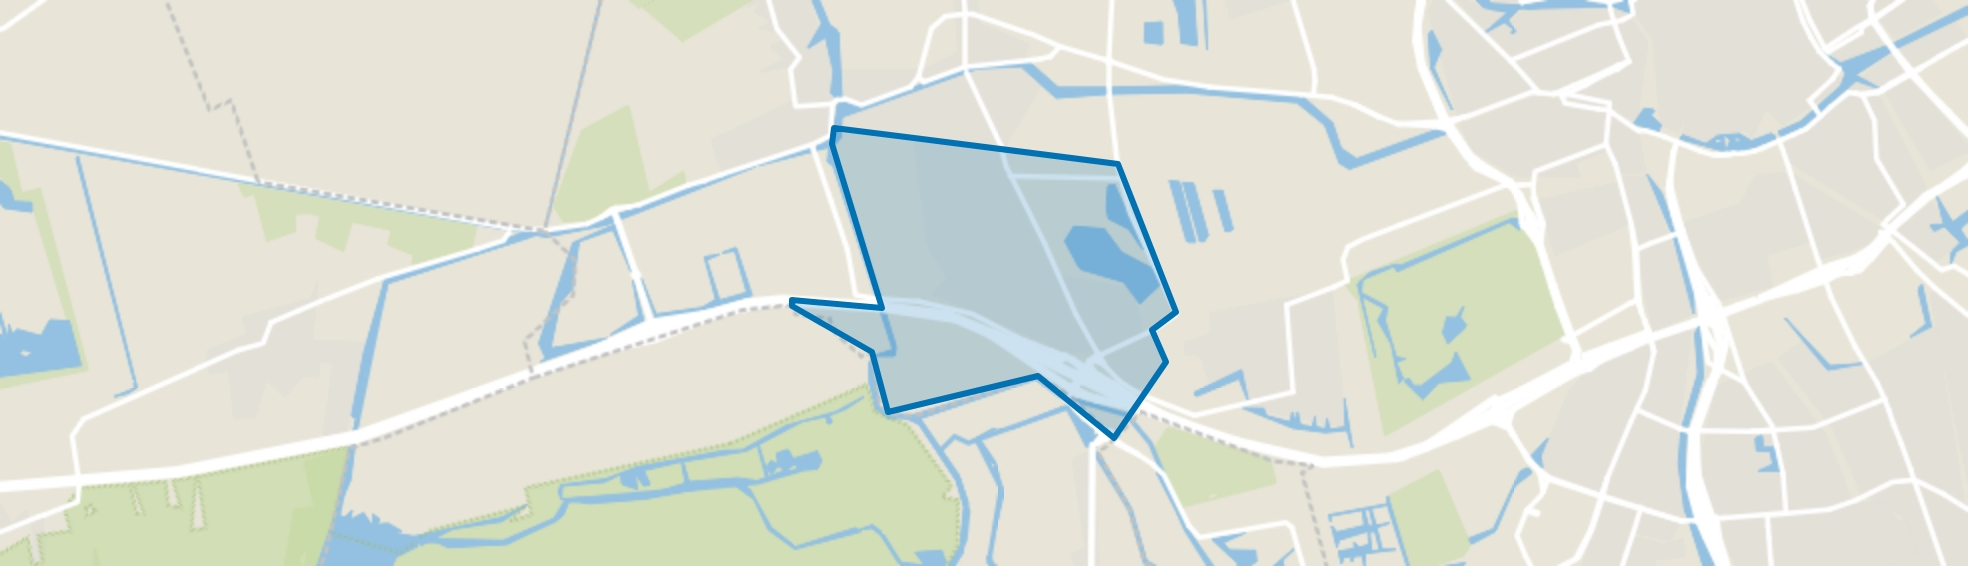 Hoogkerk-Zuid, Groningen map